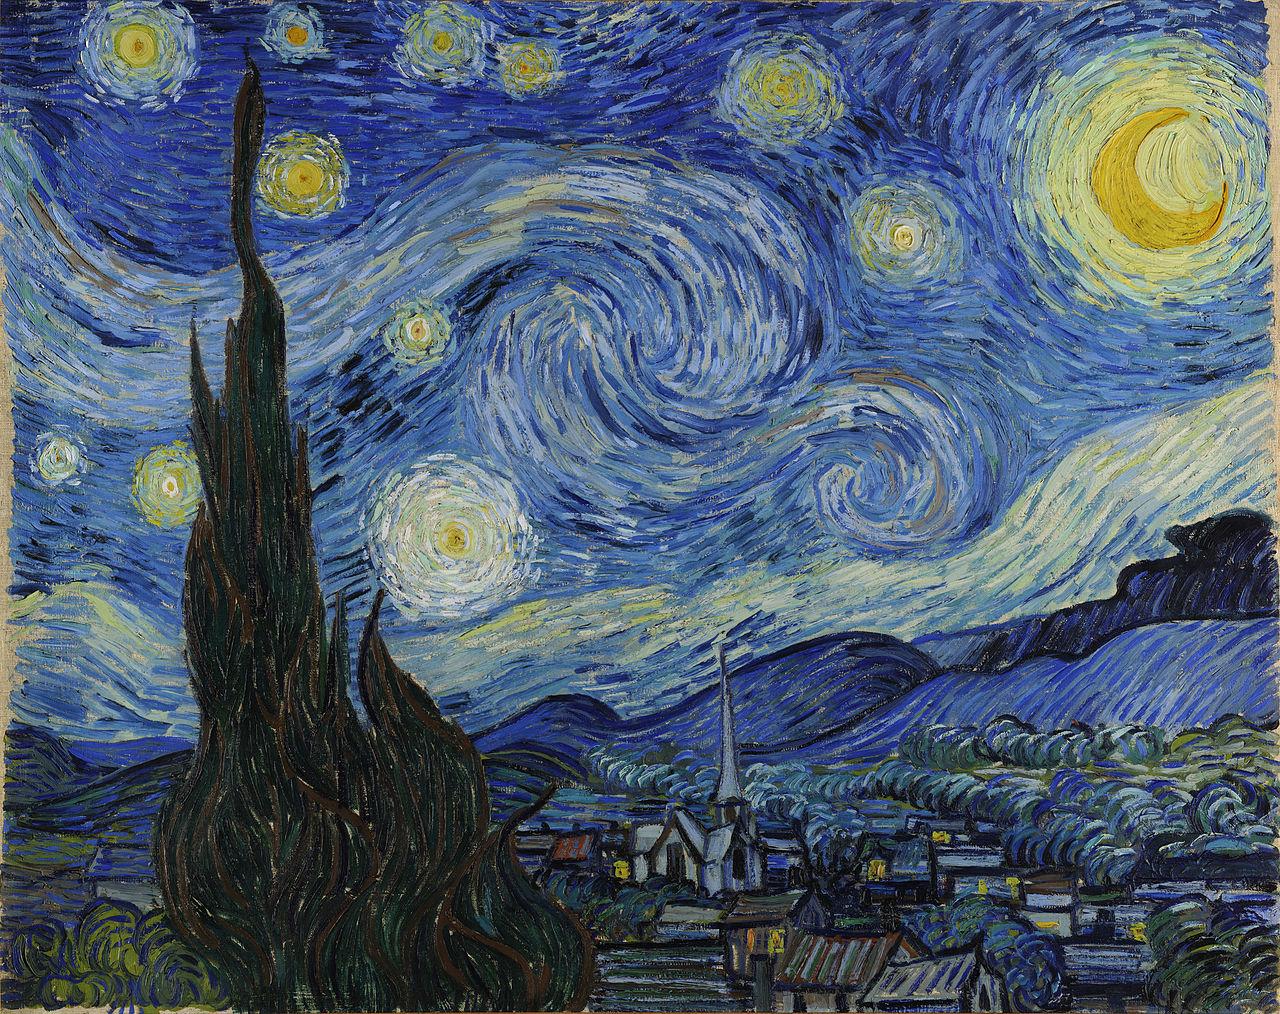 Van Gogh: Starry night